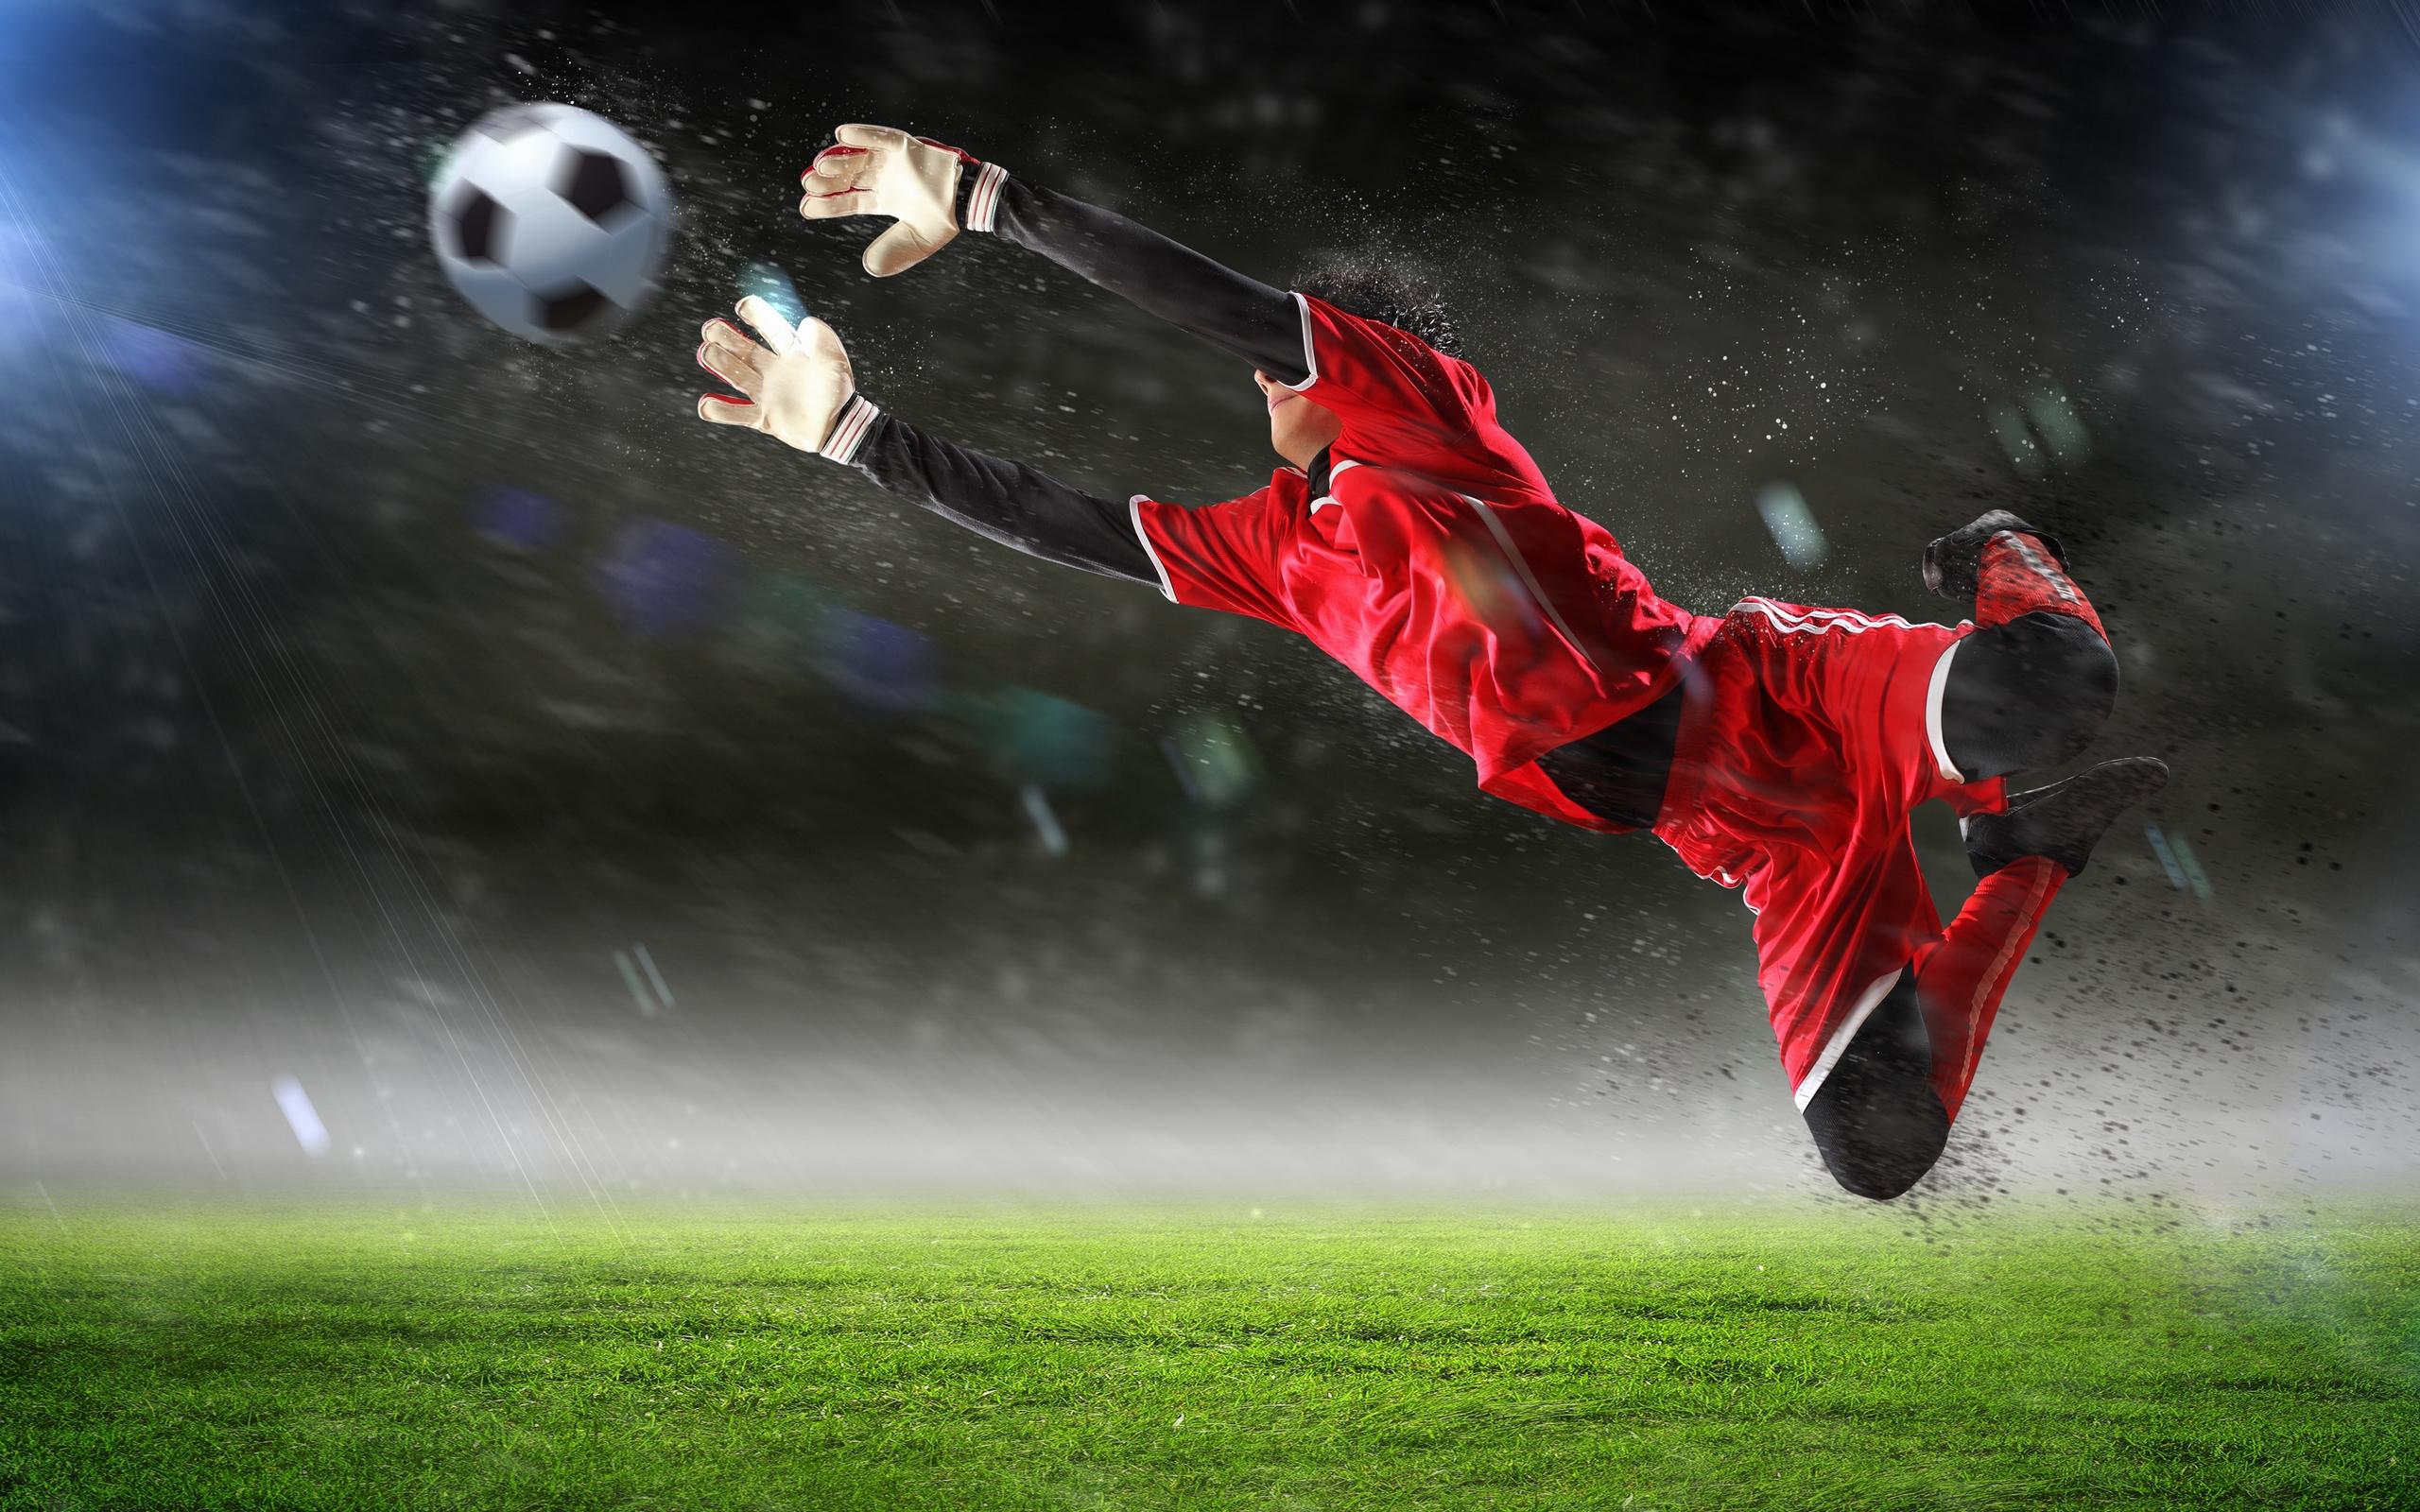 вратарь, мяч, футбол